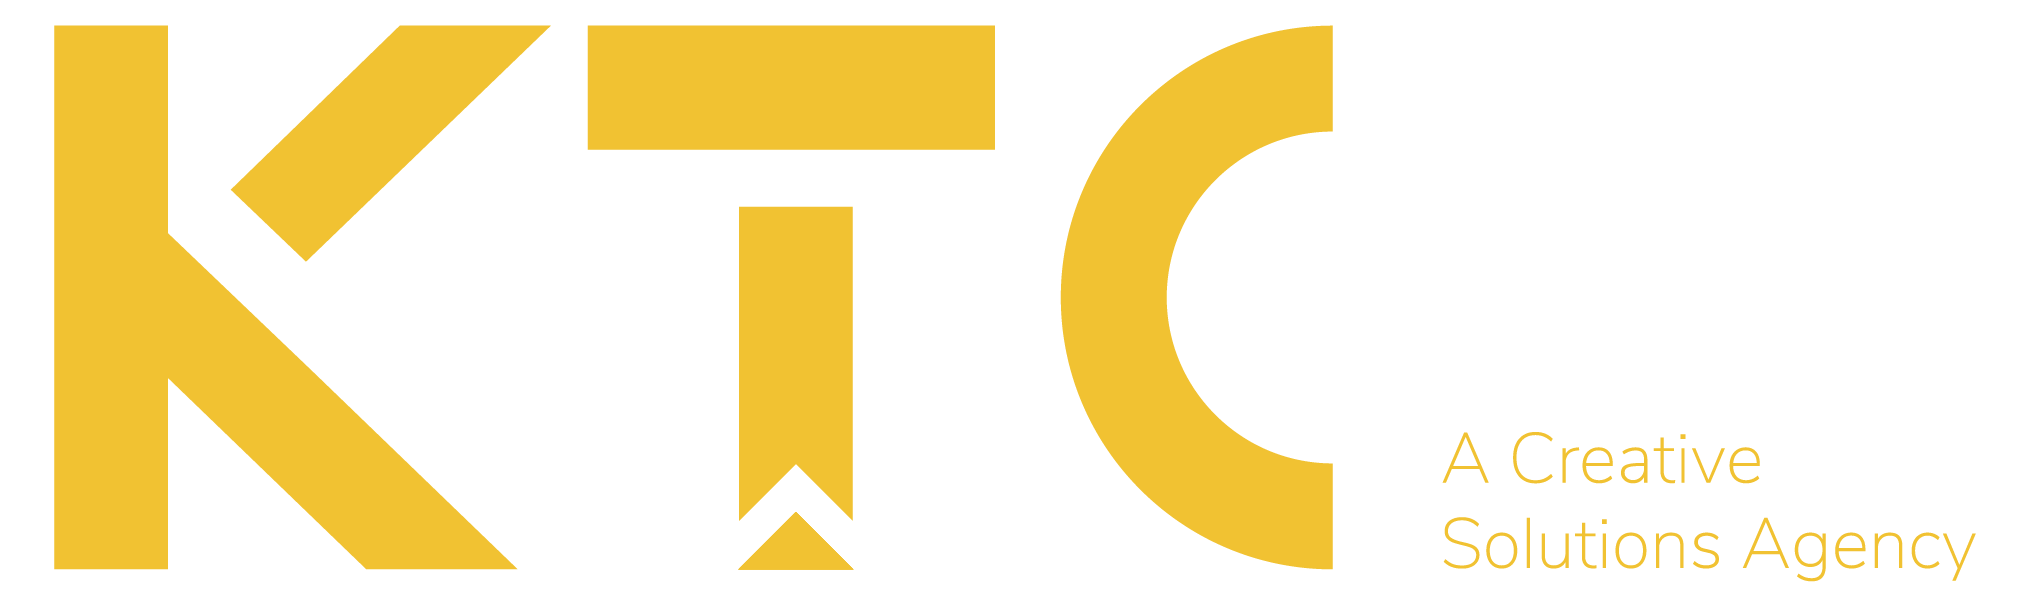 https://ktcatl.com/wp-content/uploads/2021/05/cropped-Logo-tagline-Yellow.png